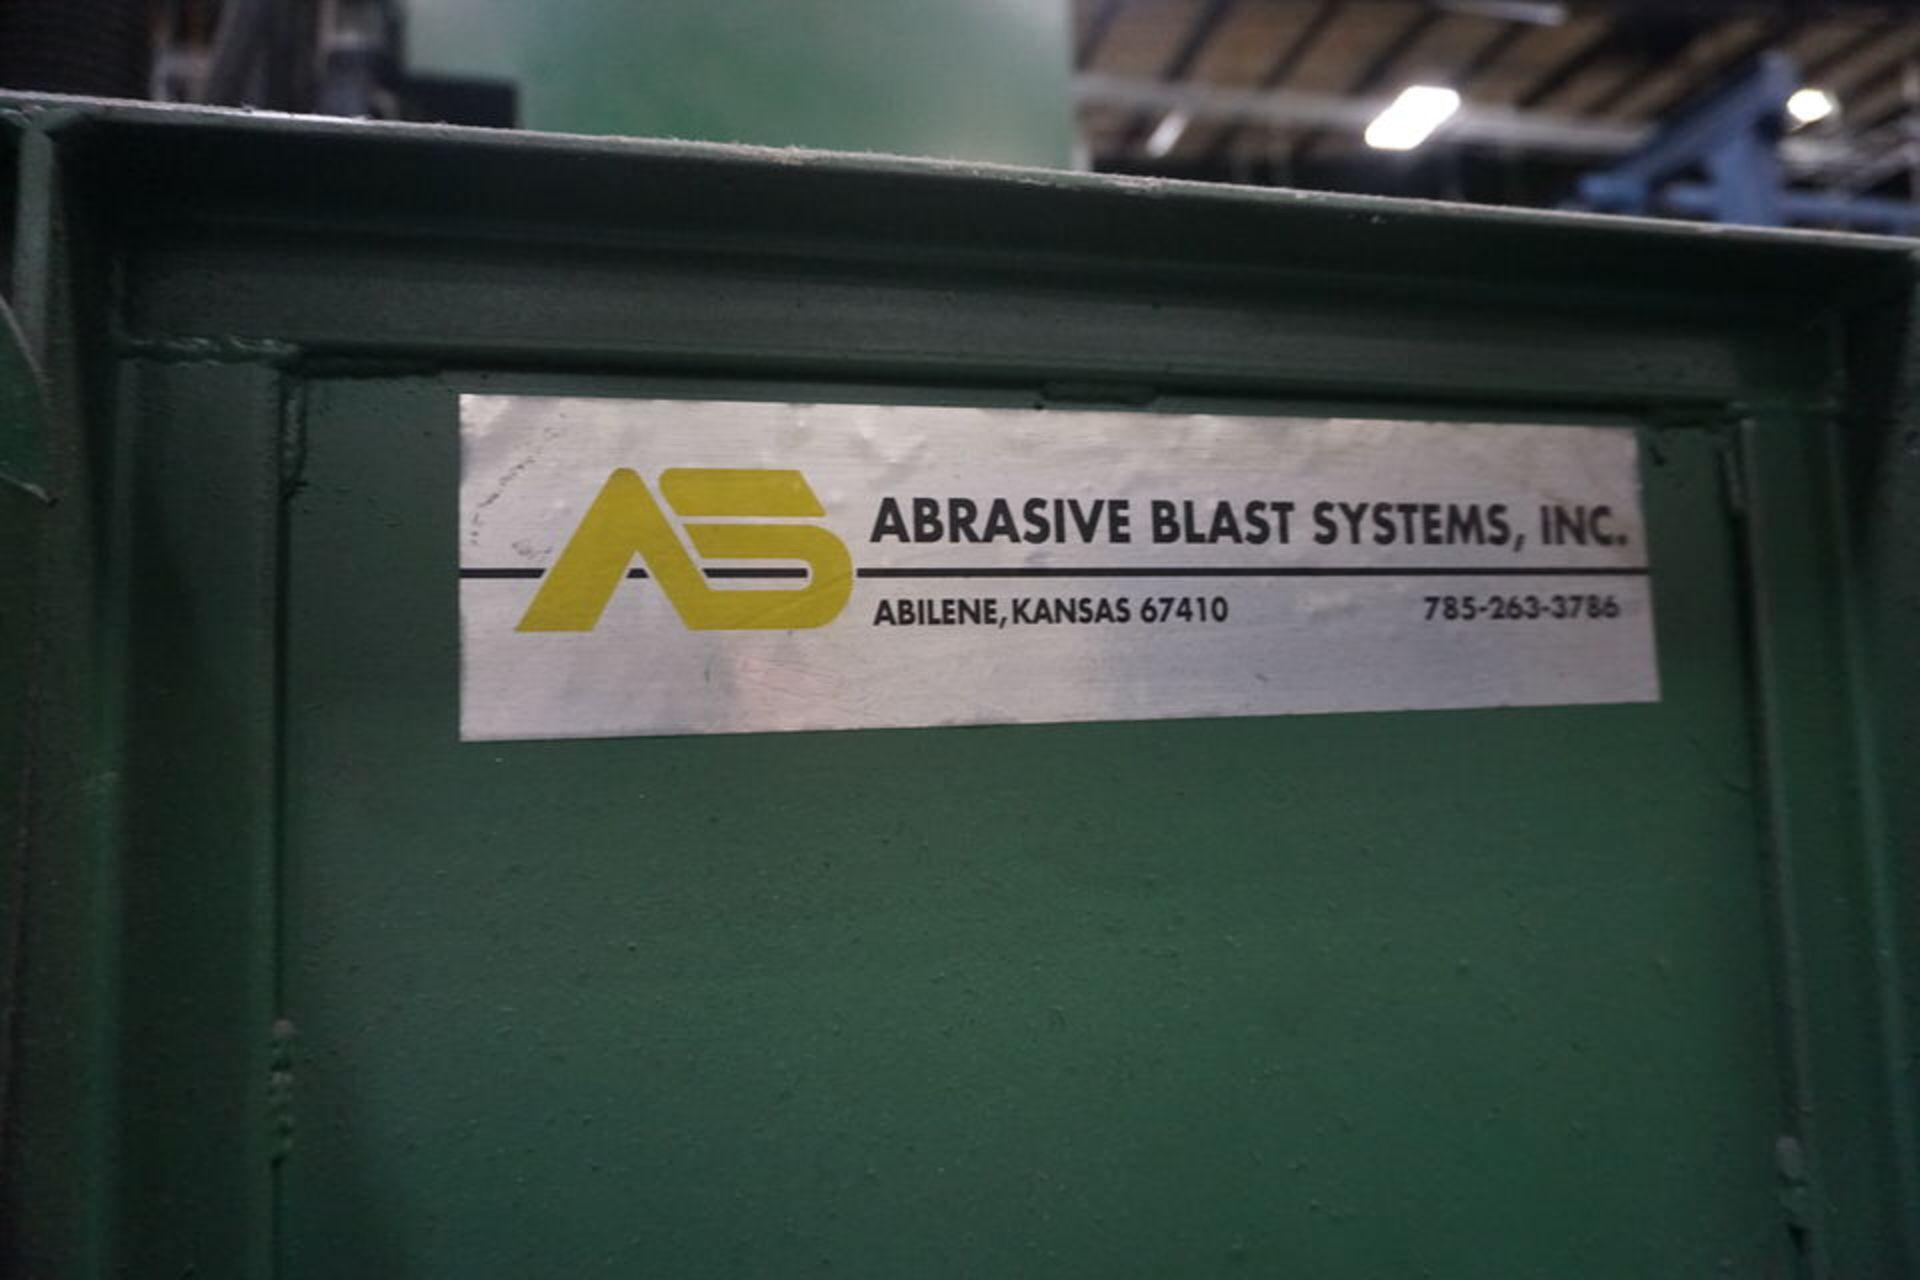 ABRASIVE SHOT PEEN BLAST SYSTEM, MDL: 3N1201 (ASST#:P863109) - Image 2 of 11